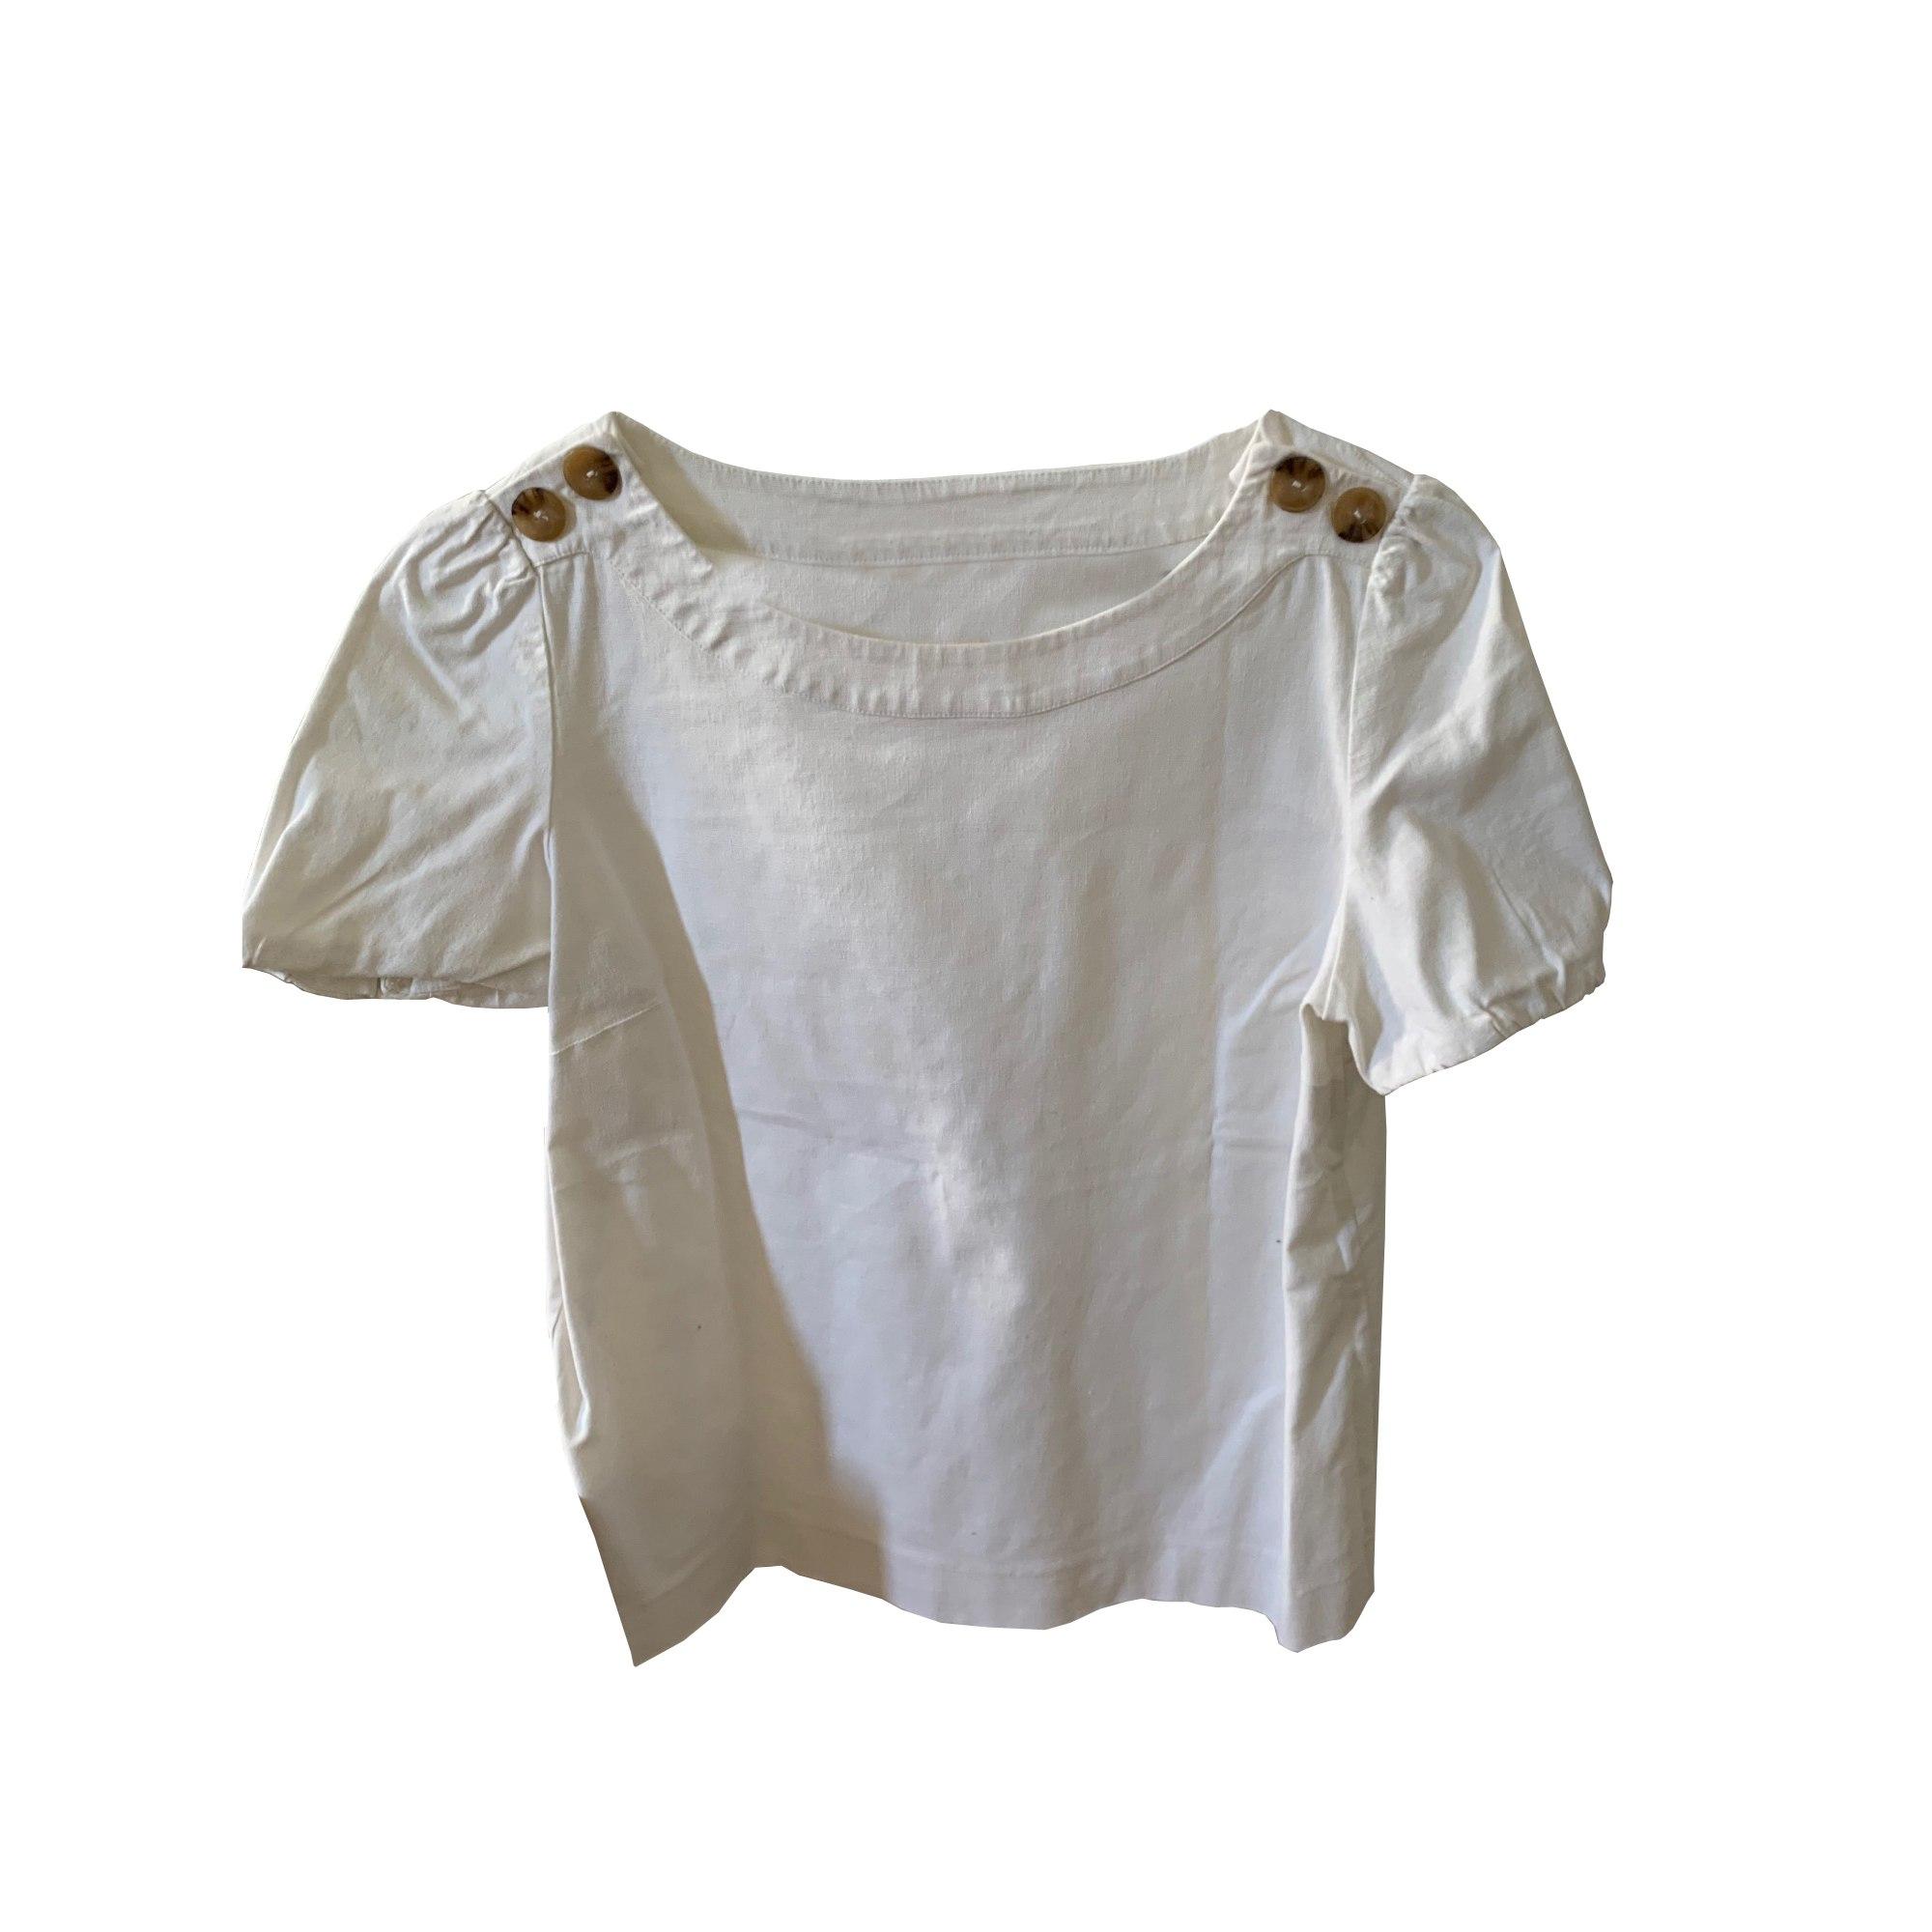 Blouse SÉZANE Blanc, blanc cassé, écru